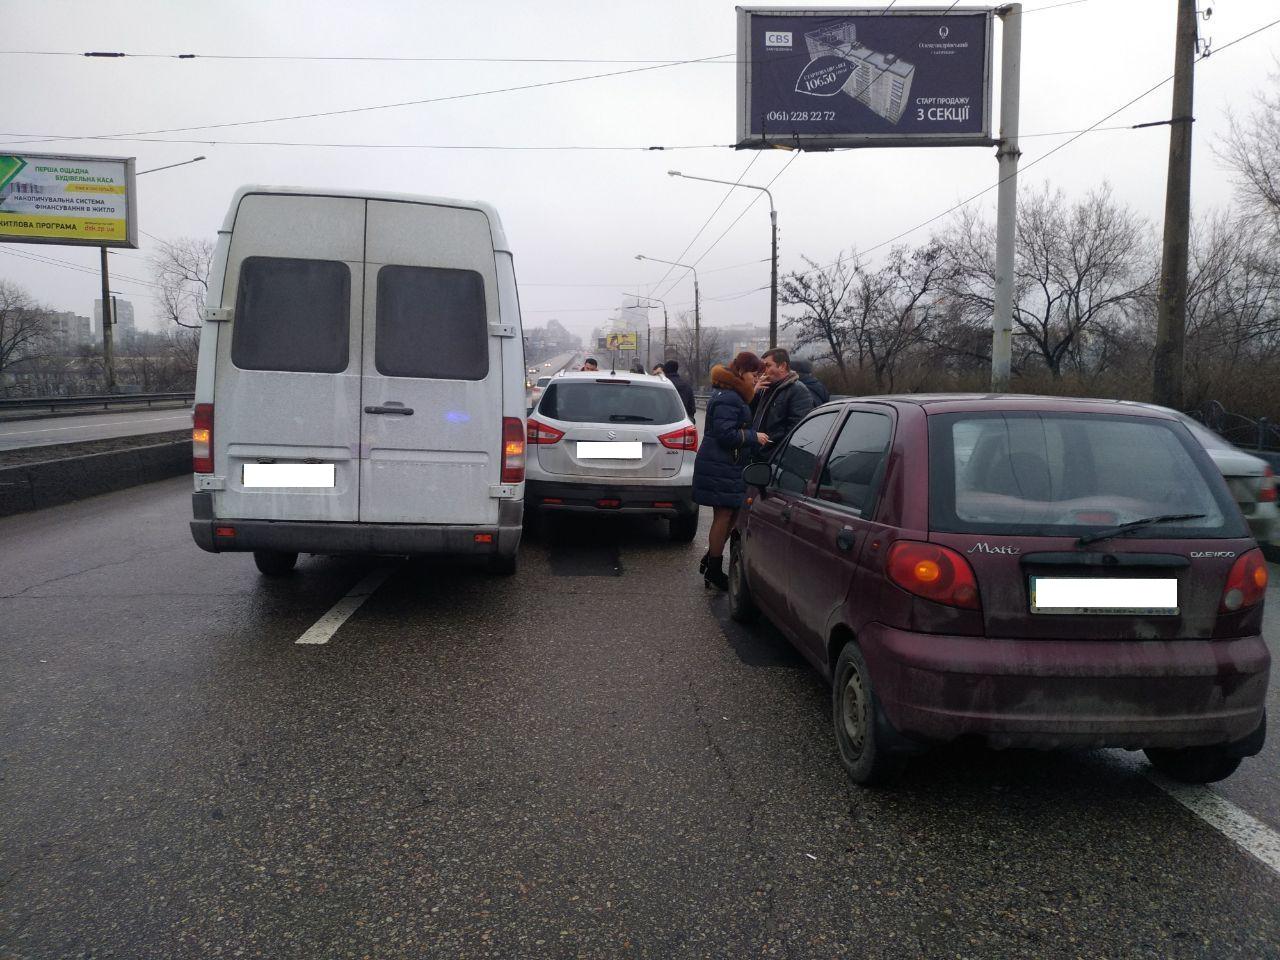 В Запорожье на дамбе произошло тройное ДТП с участием микроавтобуса - ФОТО